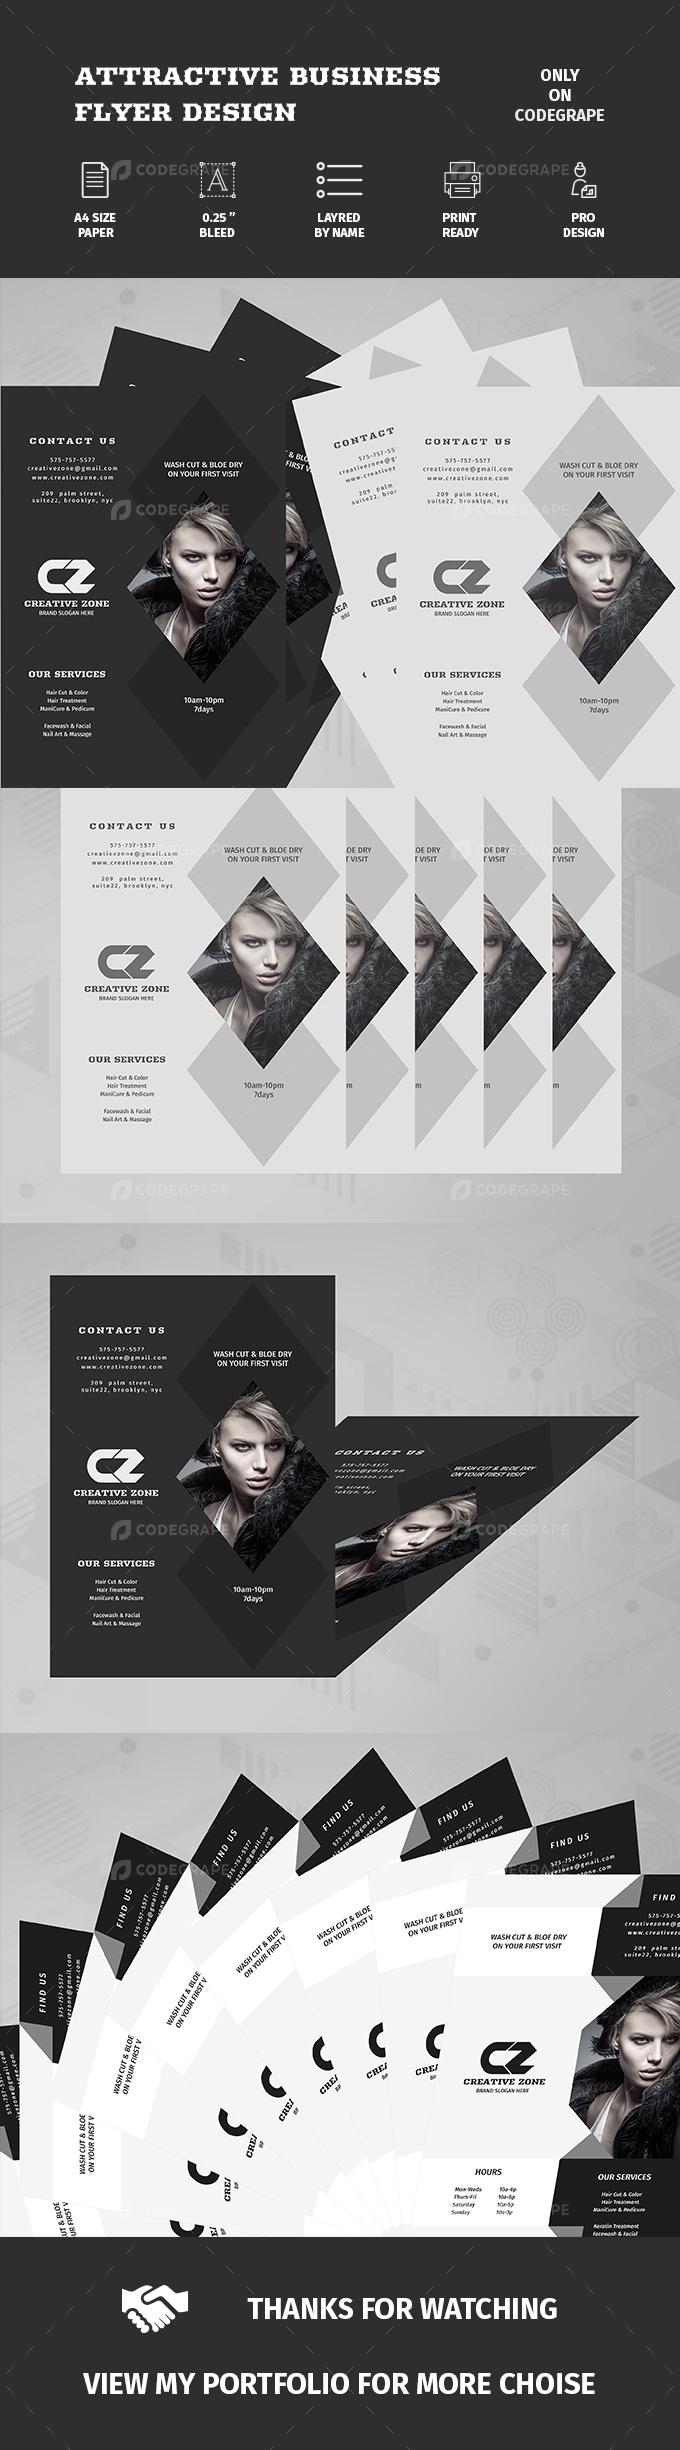 Attractive Business Flyer Design